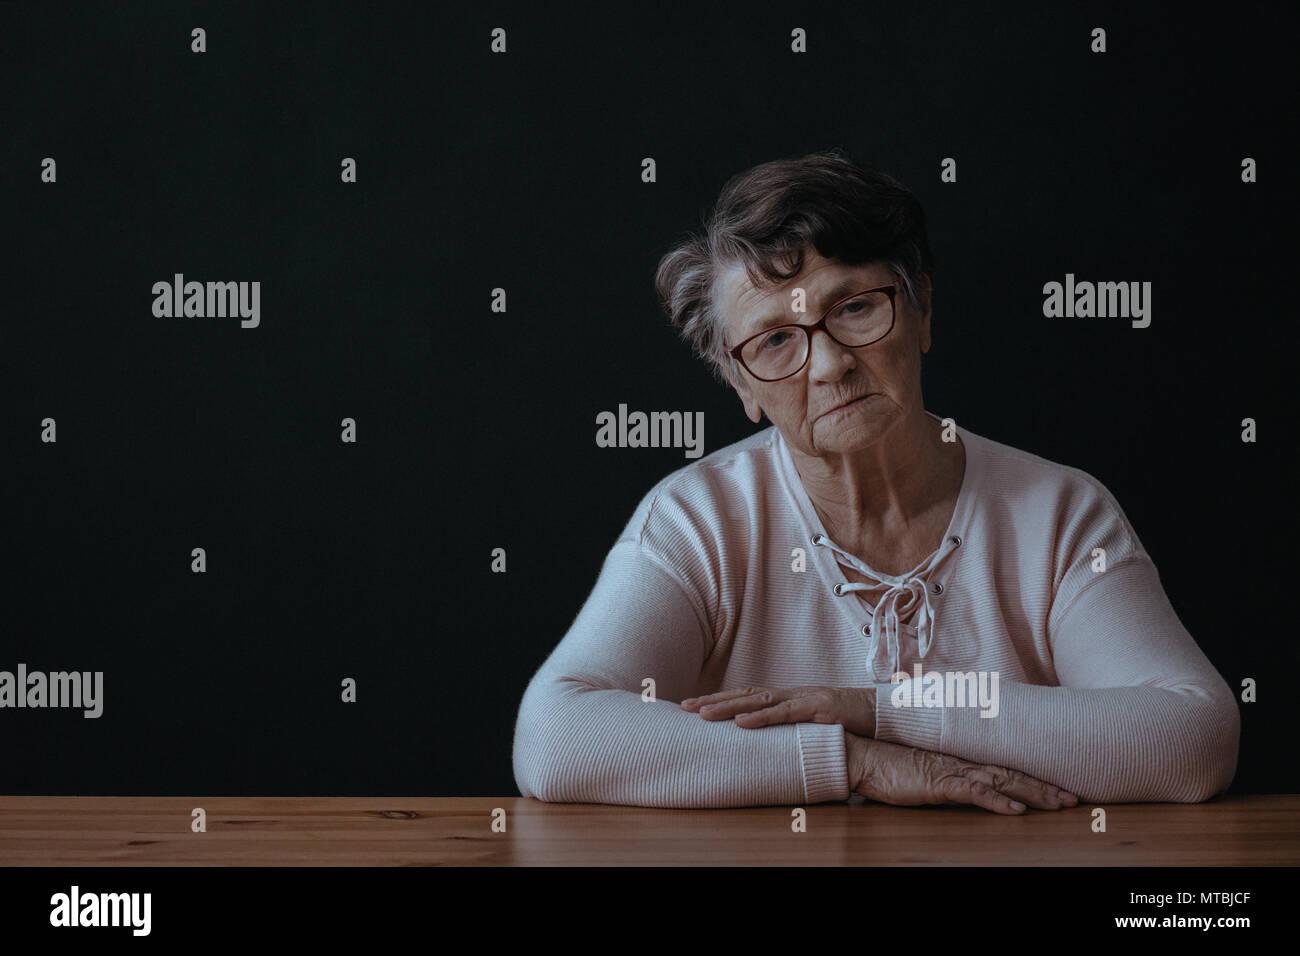 Sad, elderly woman sitting alone beside table - Stock Image